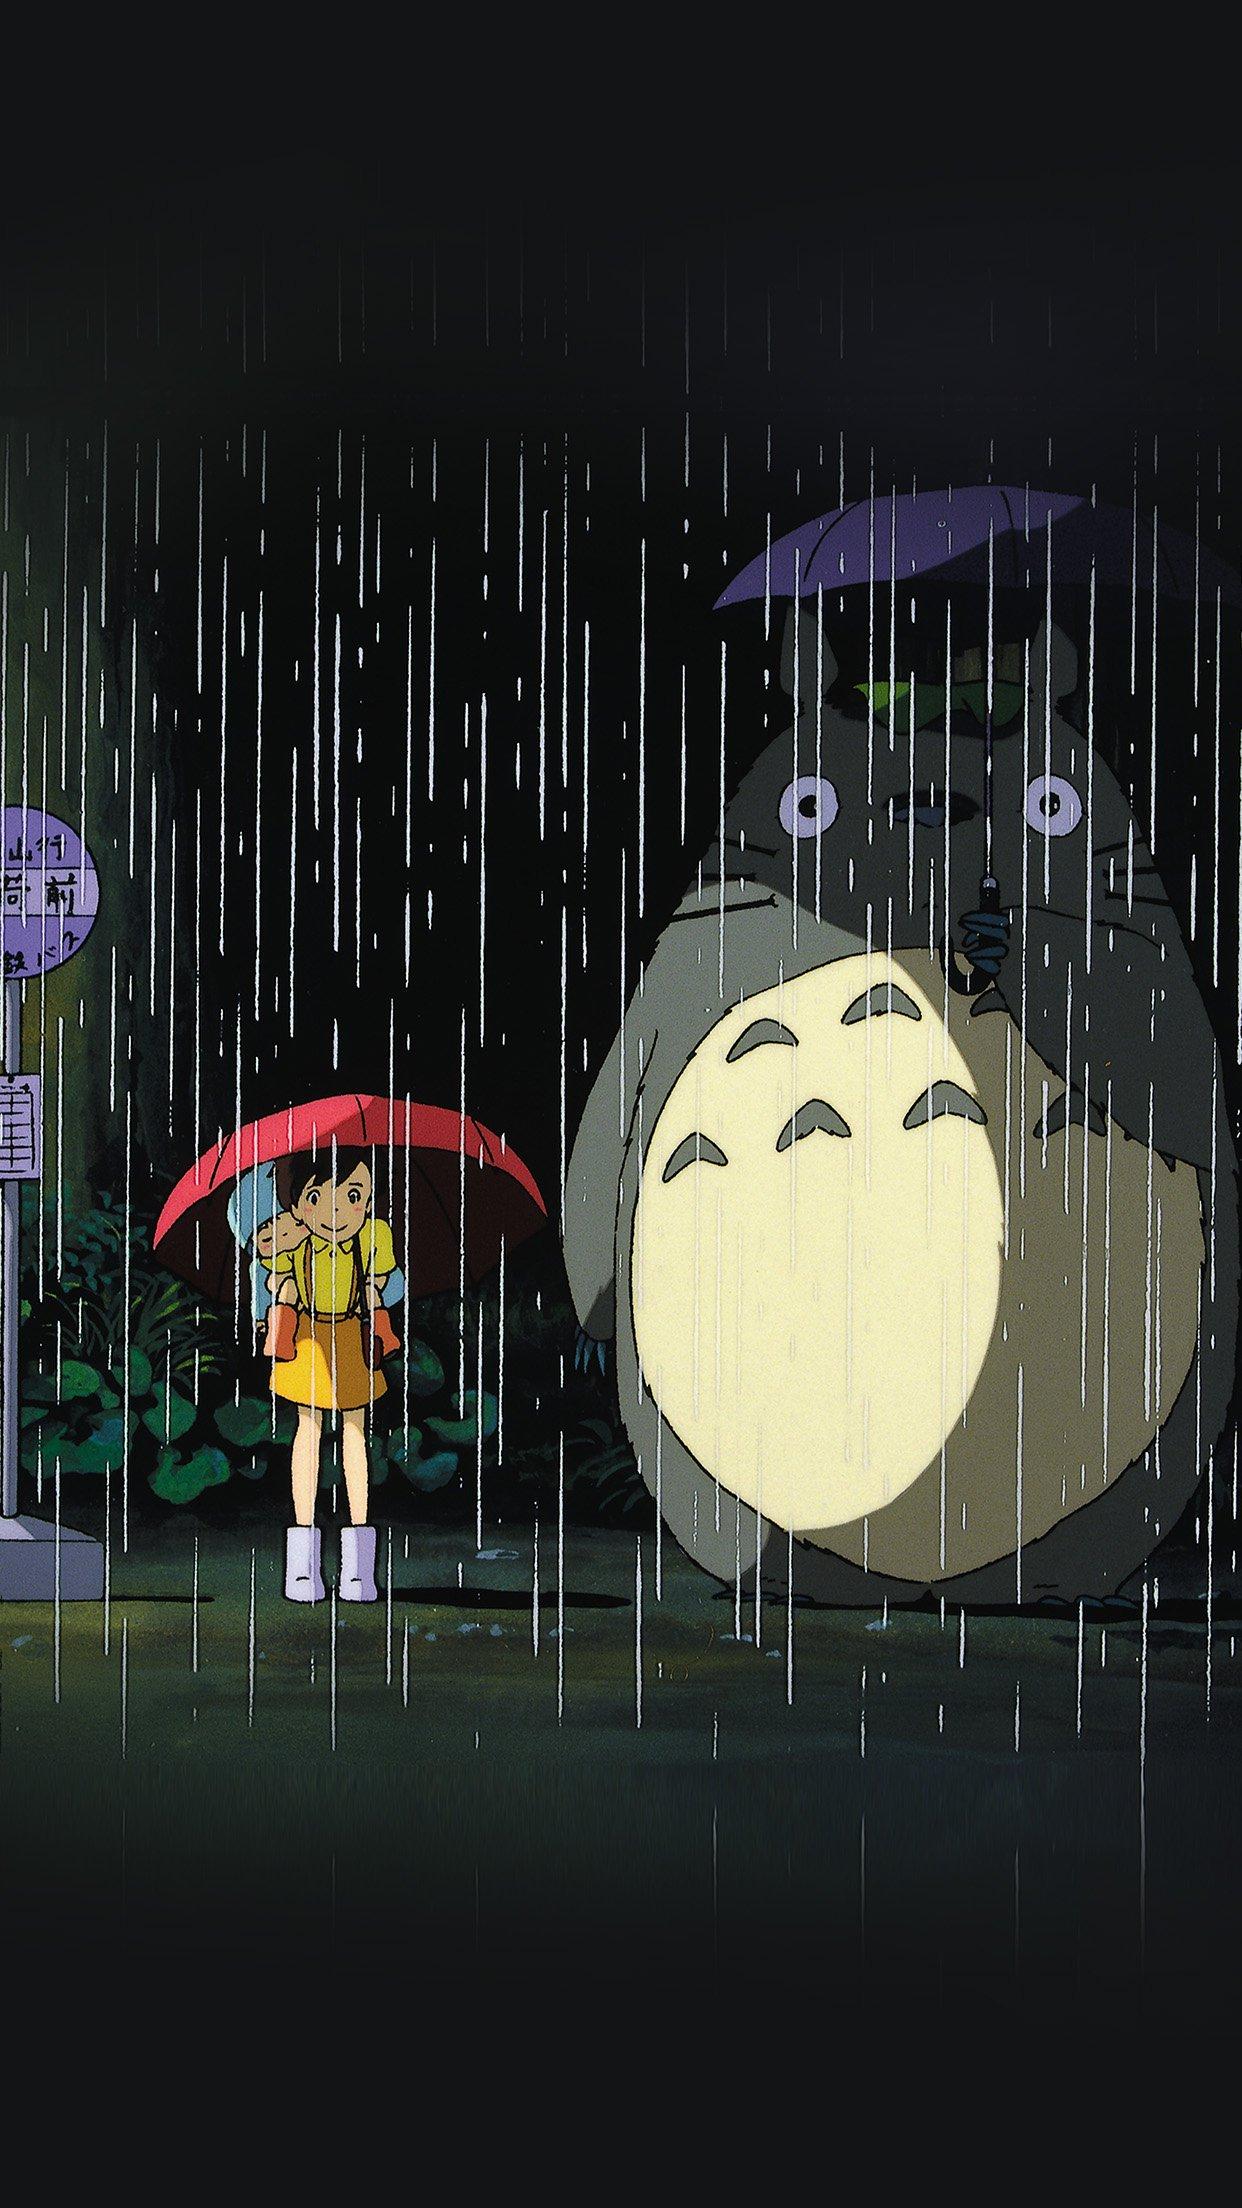 Most Inspiring Wallpaper Anime Aesthetic - My-Neighbor-Totoro-Art-Illust-Rain-Anime  Photograph_22537      .jpg